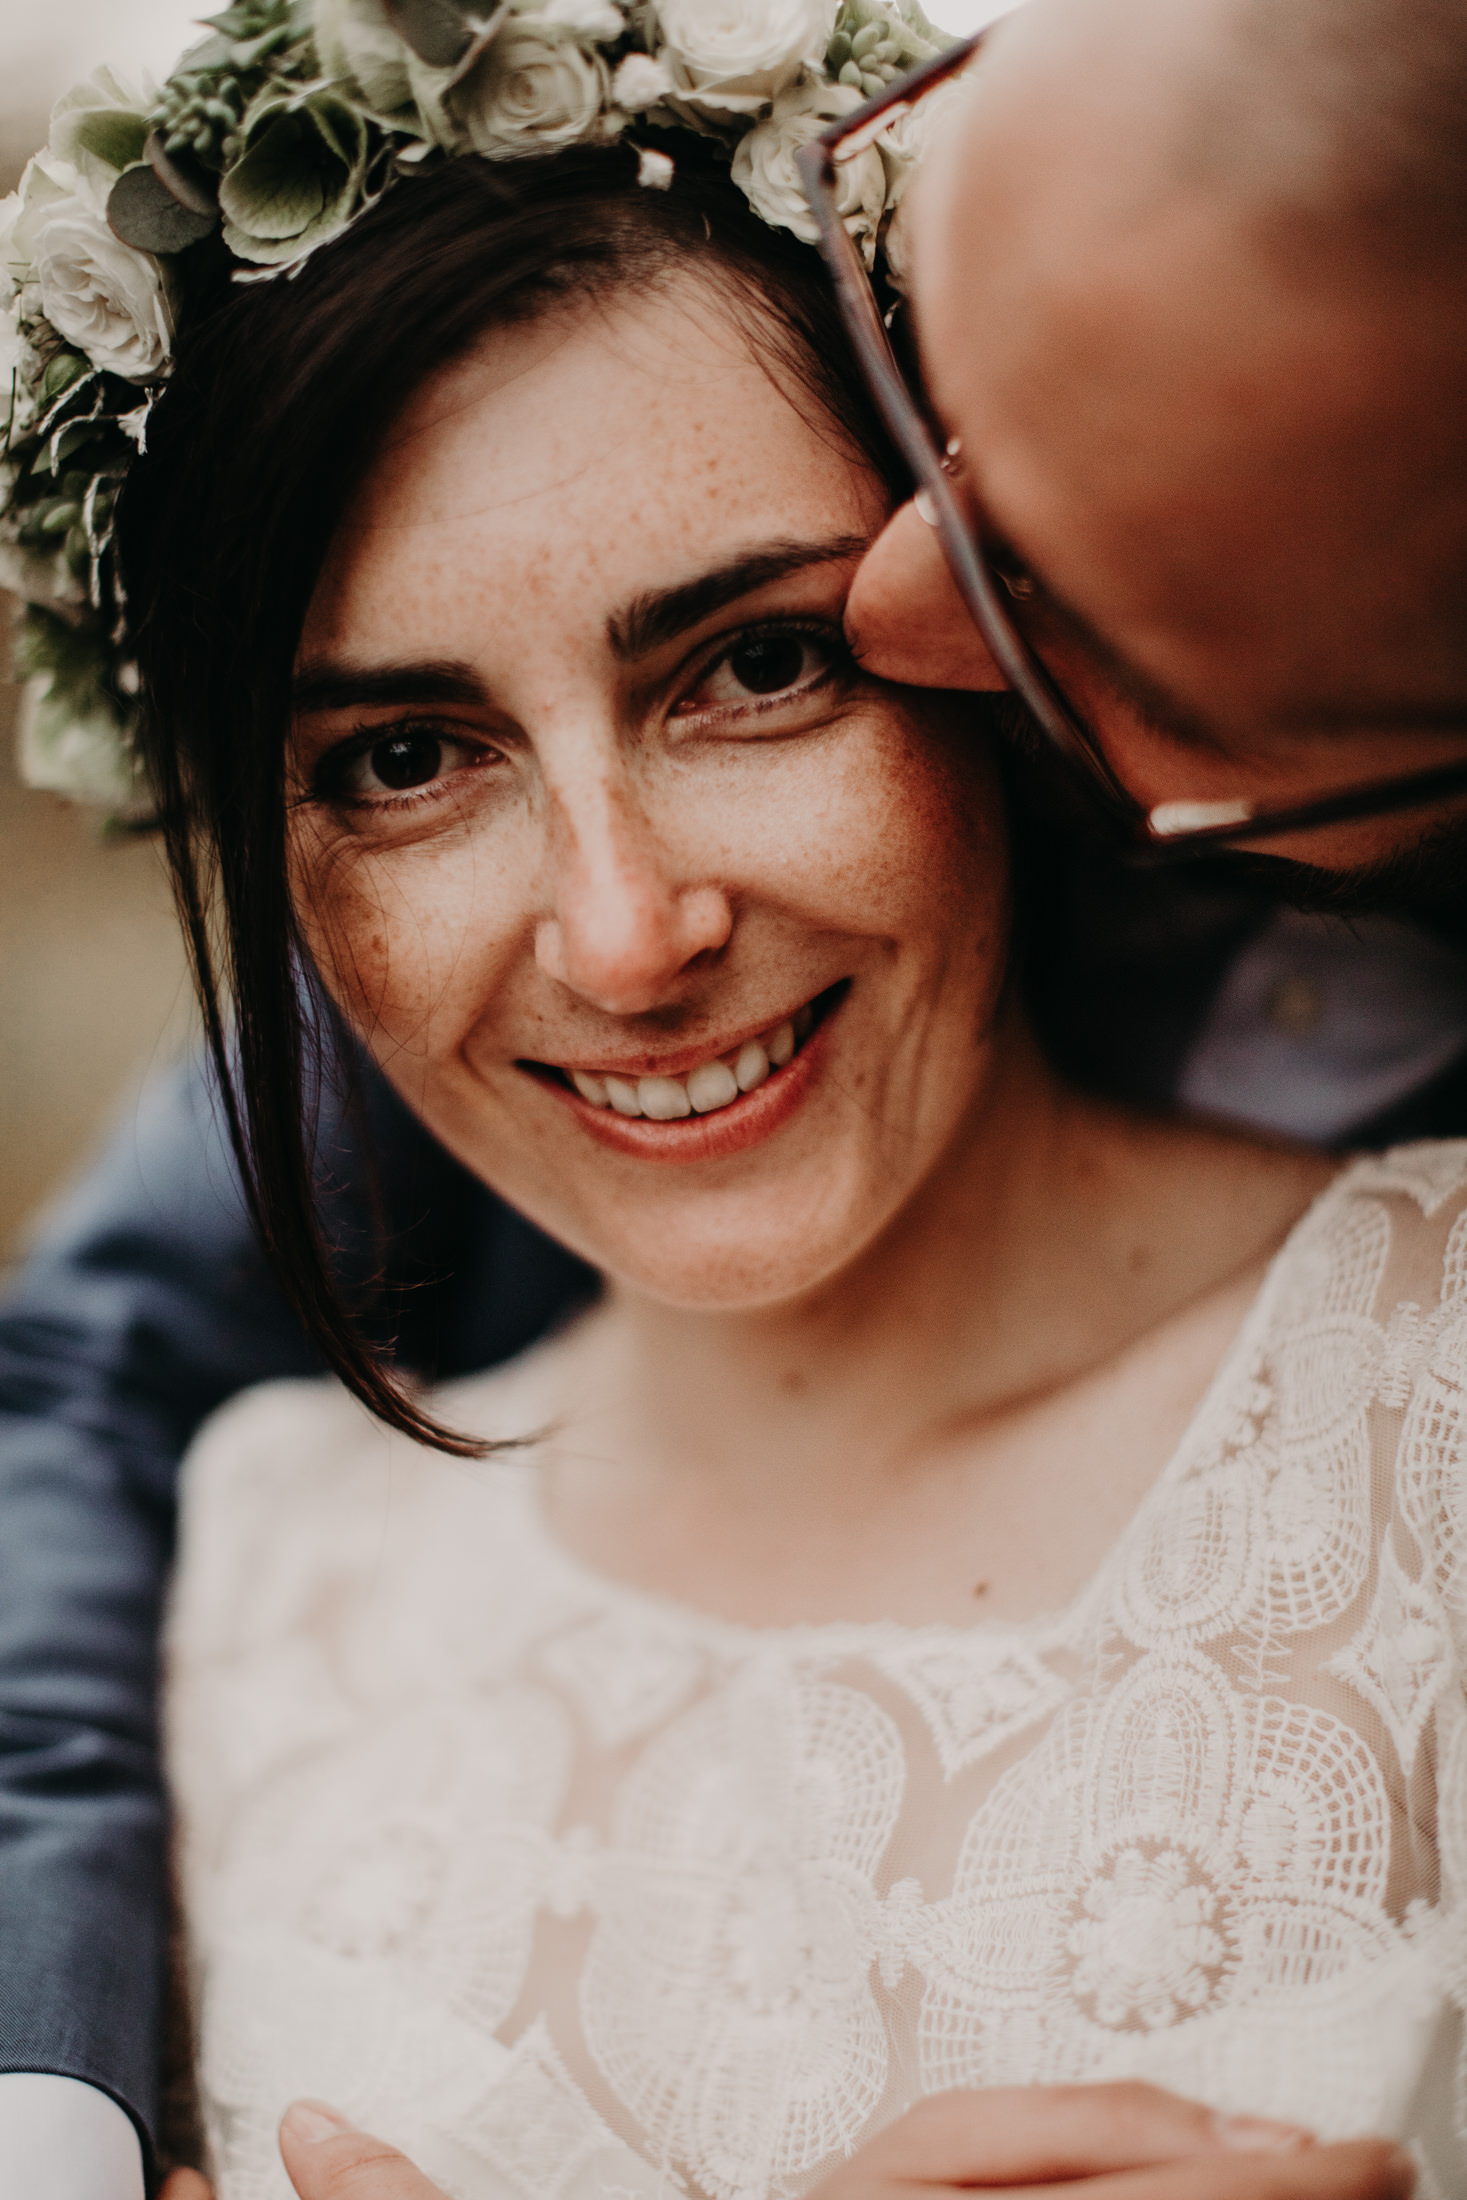 Mariage alsace germany wedding kid-60.jpg